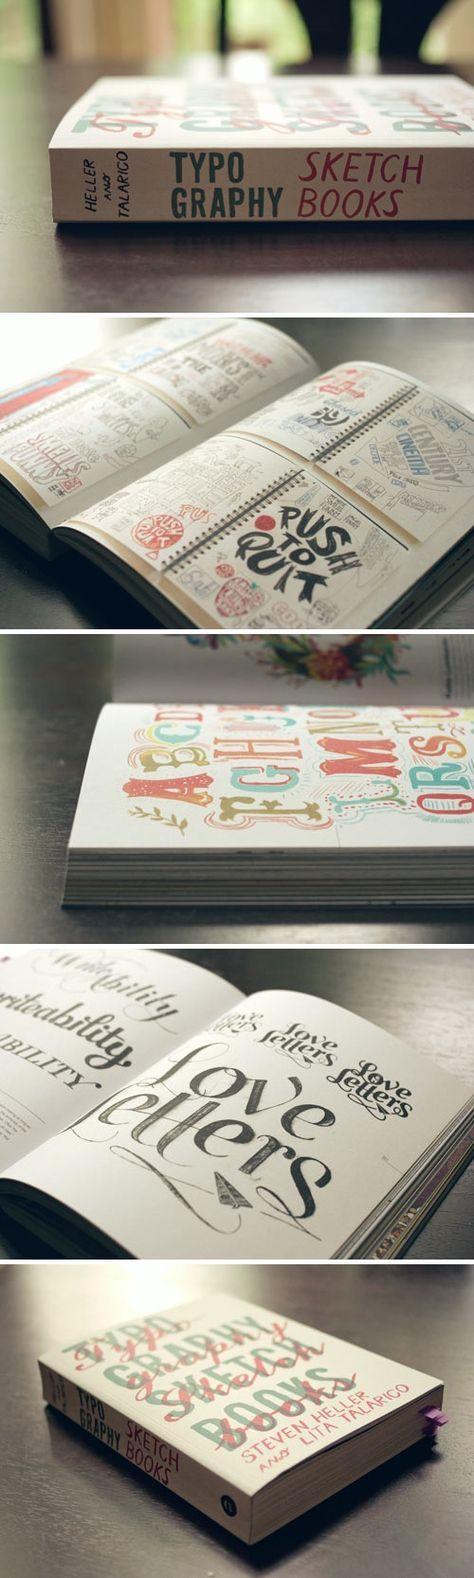 Typography Sketchbooks...resource for improving hand lettering skills!